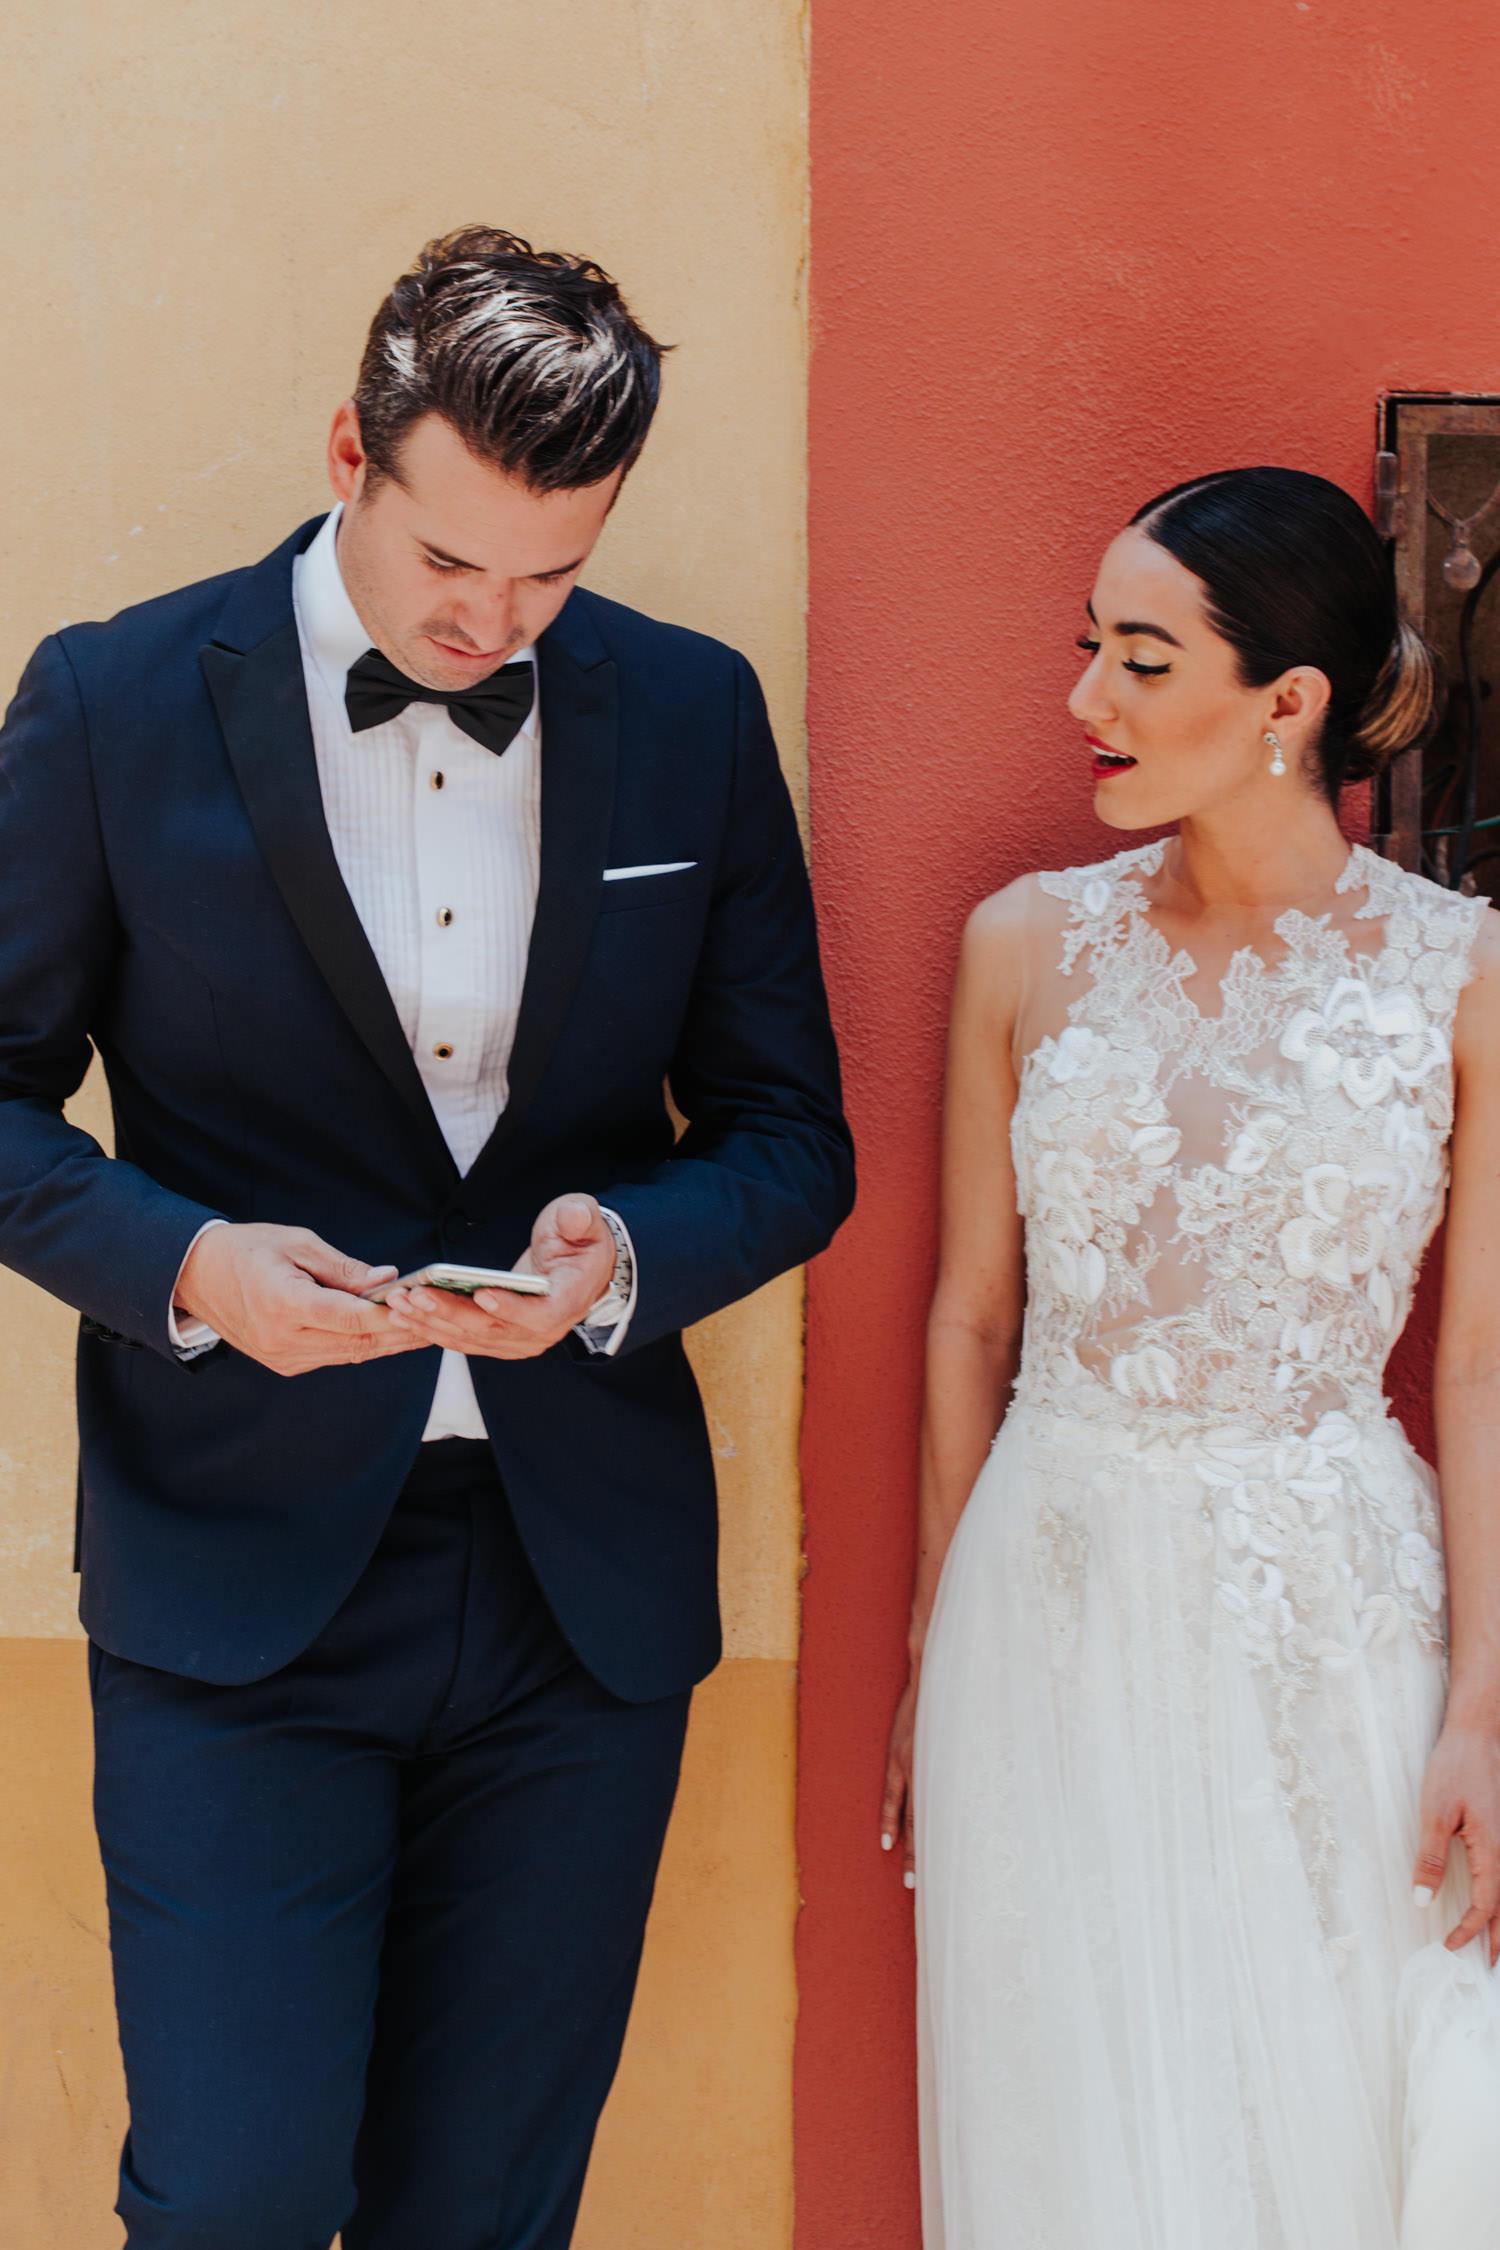 San-Miguel-de-Allende-Wedding-Photography-Parroquia-Instituto-Boda-Fotografia-Fer-Sergio-Pierce-Lifestyle-Photography0133.JPG